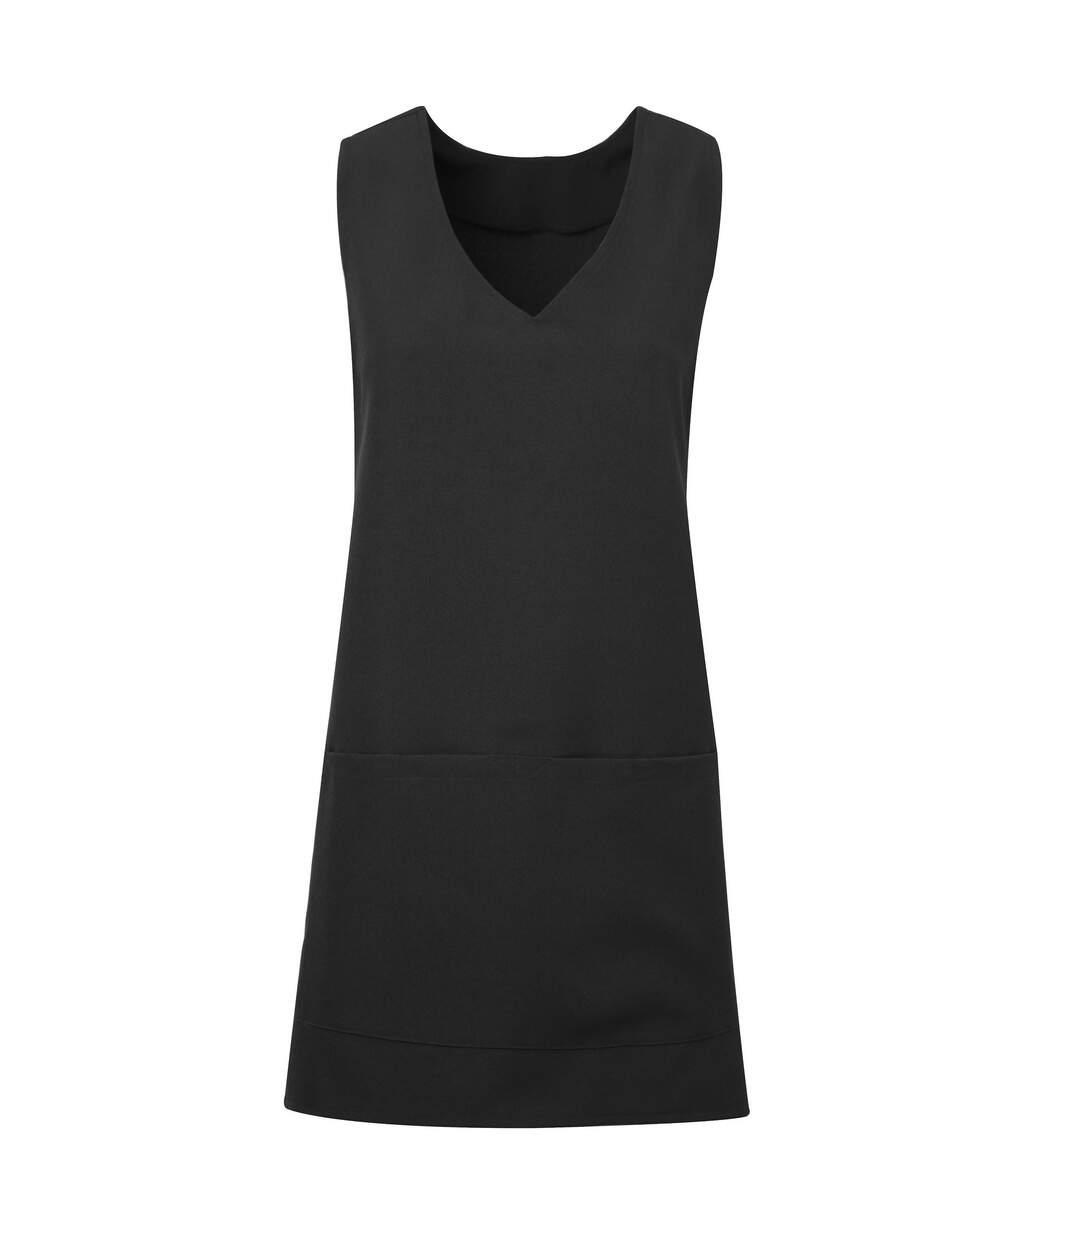 Premier Unisex Wrap-Around Tunic (Black) - UTRW5594